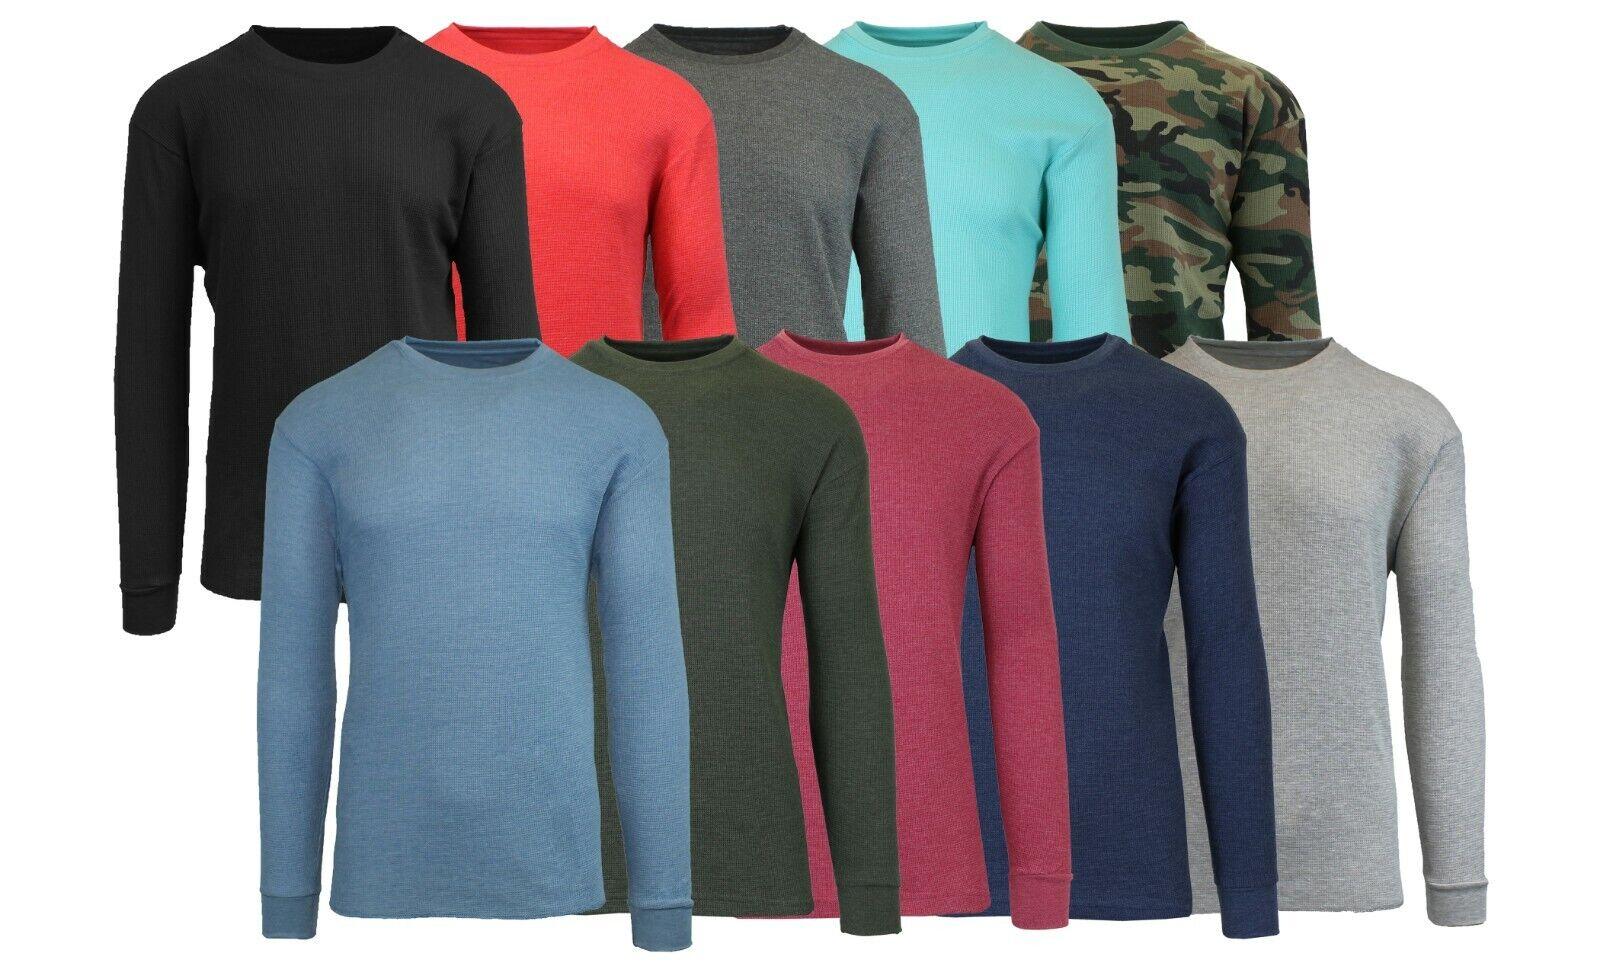 Men's Long Sleeve Waffle Thermal Shirt Tee -Crew Neck Layeri